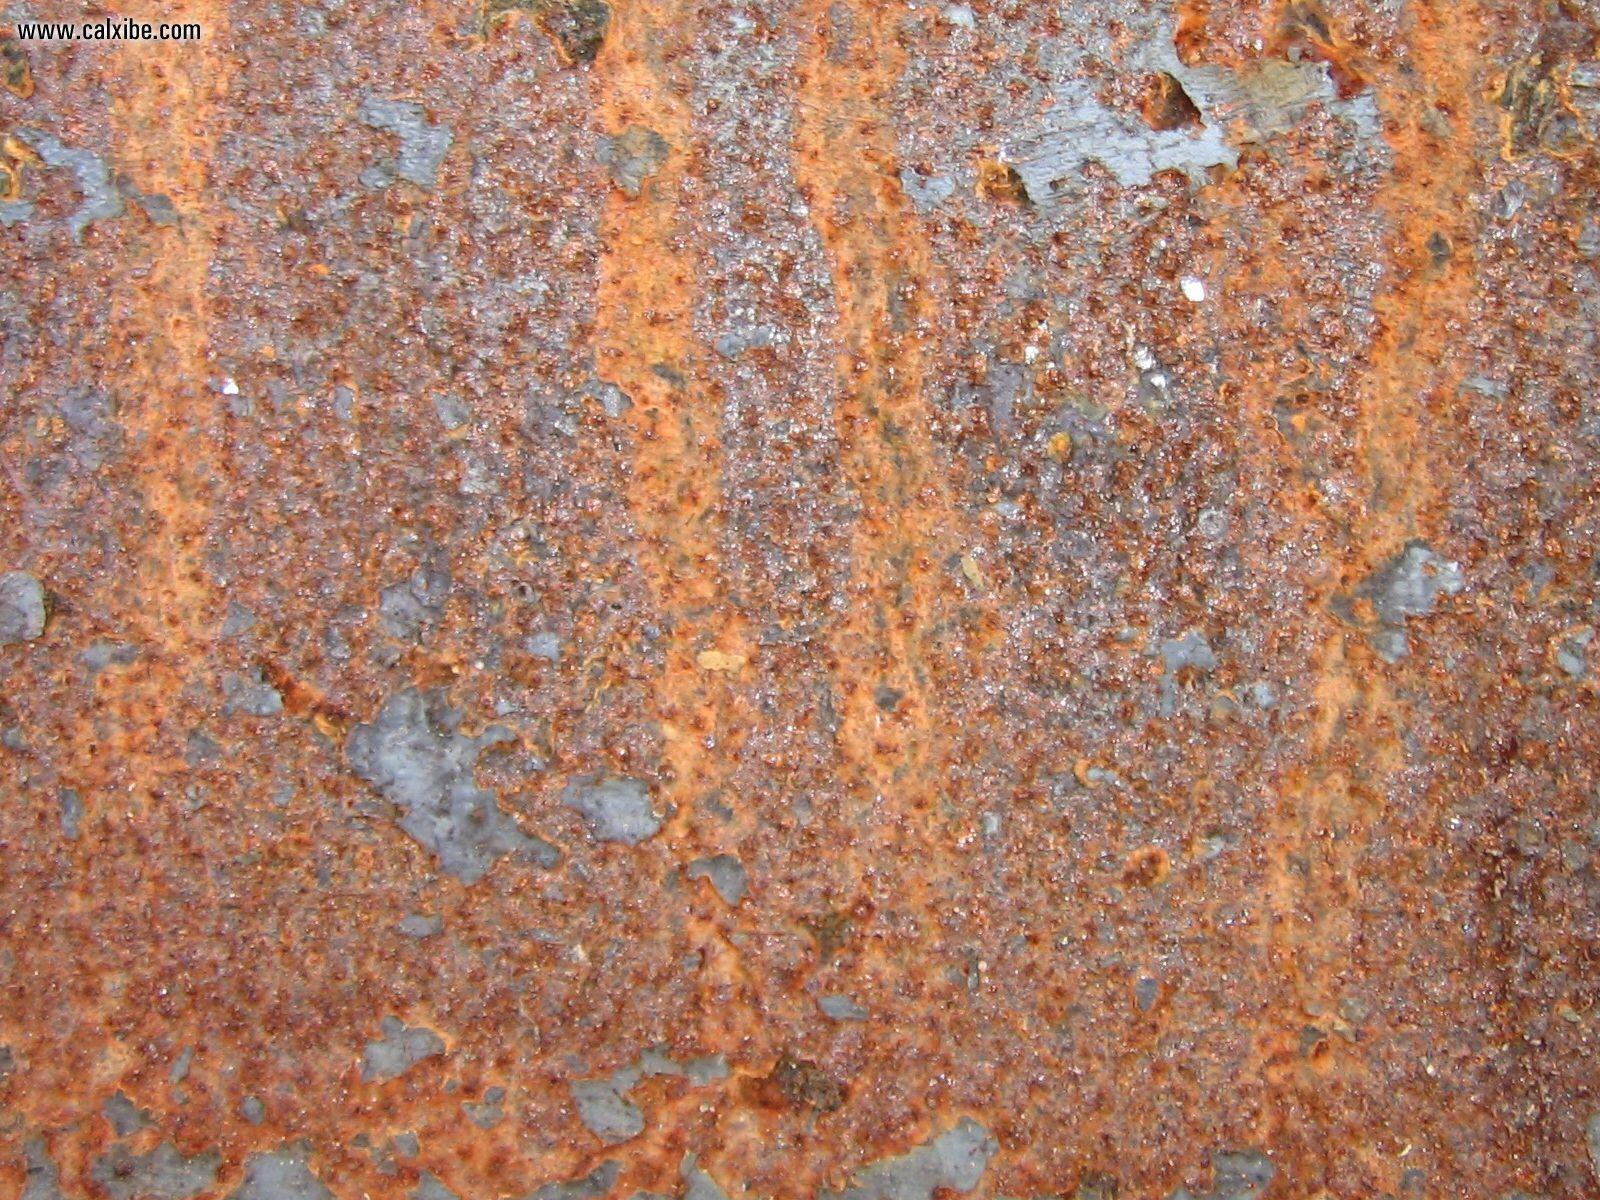 Development Rusty Metal picture nr 15953 1600x1200